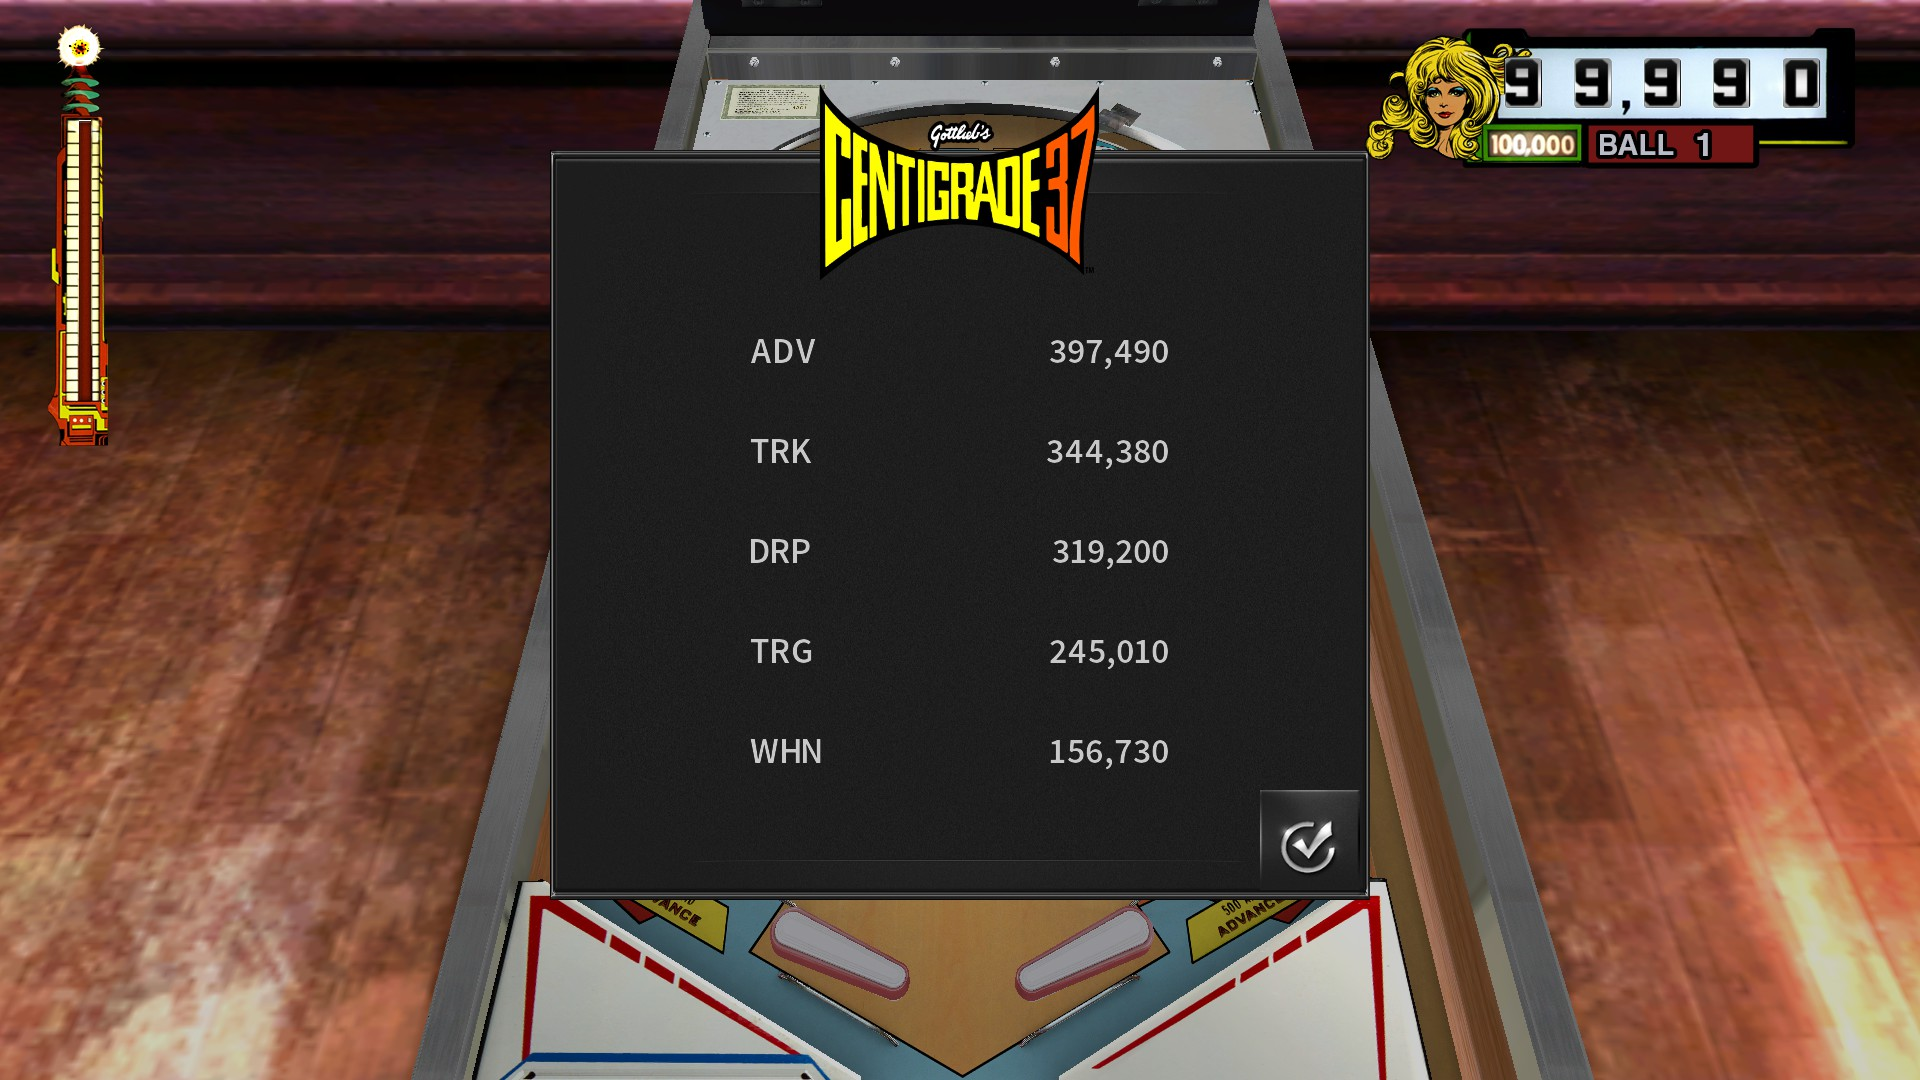 TheTrickster: Pinball Arcade: Centigrade 37 (PC) 344,380 points on 2016-12-05 05:01:00